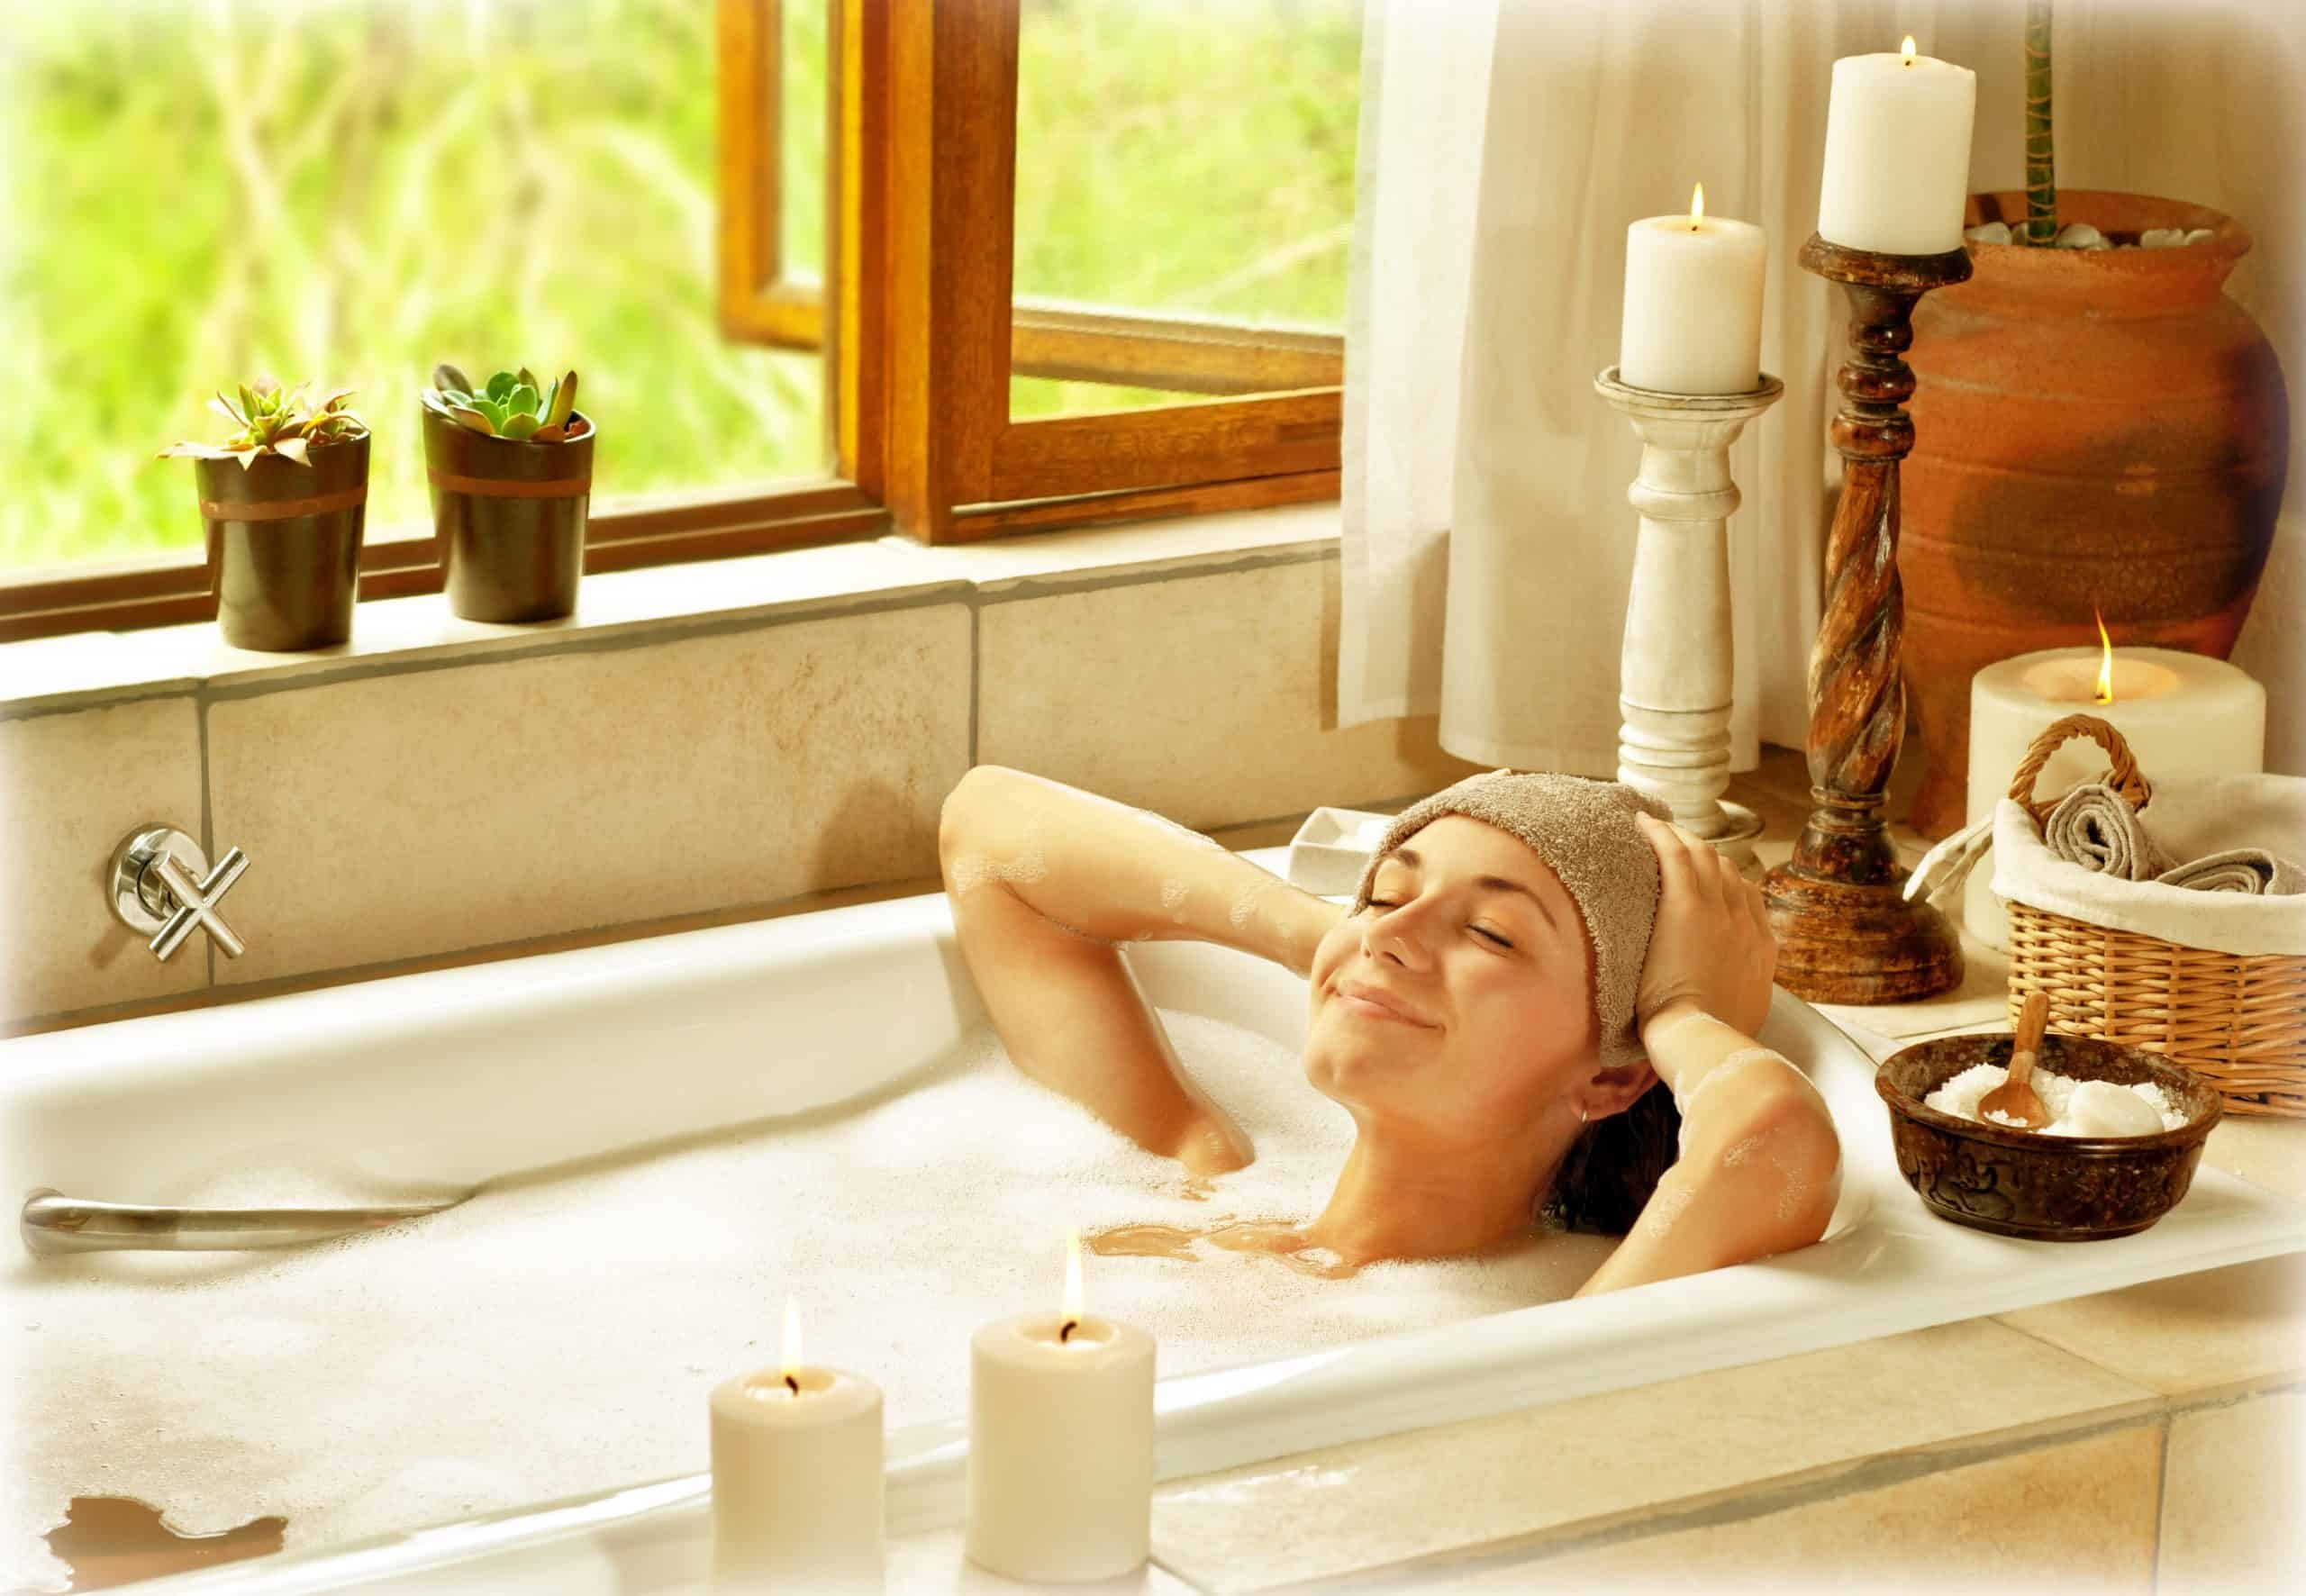 DIY spa gift basket - woman relaxing in bath tub